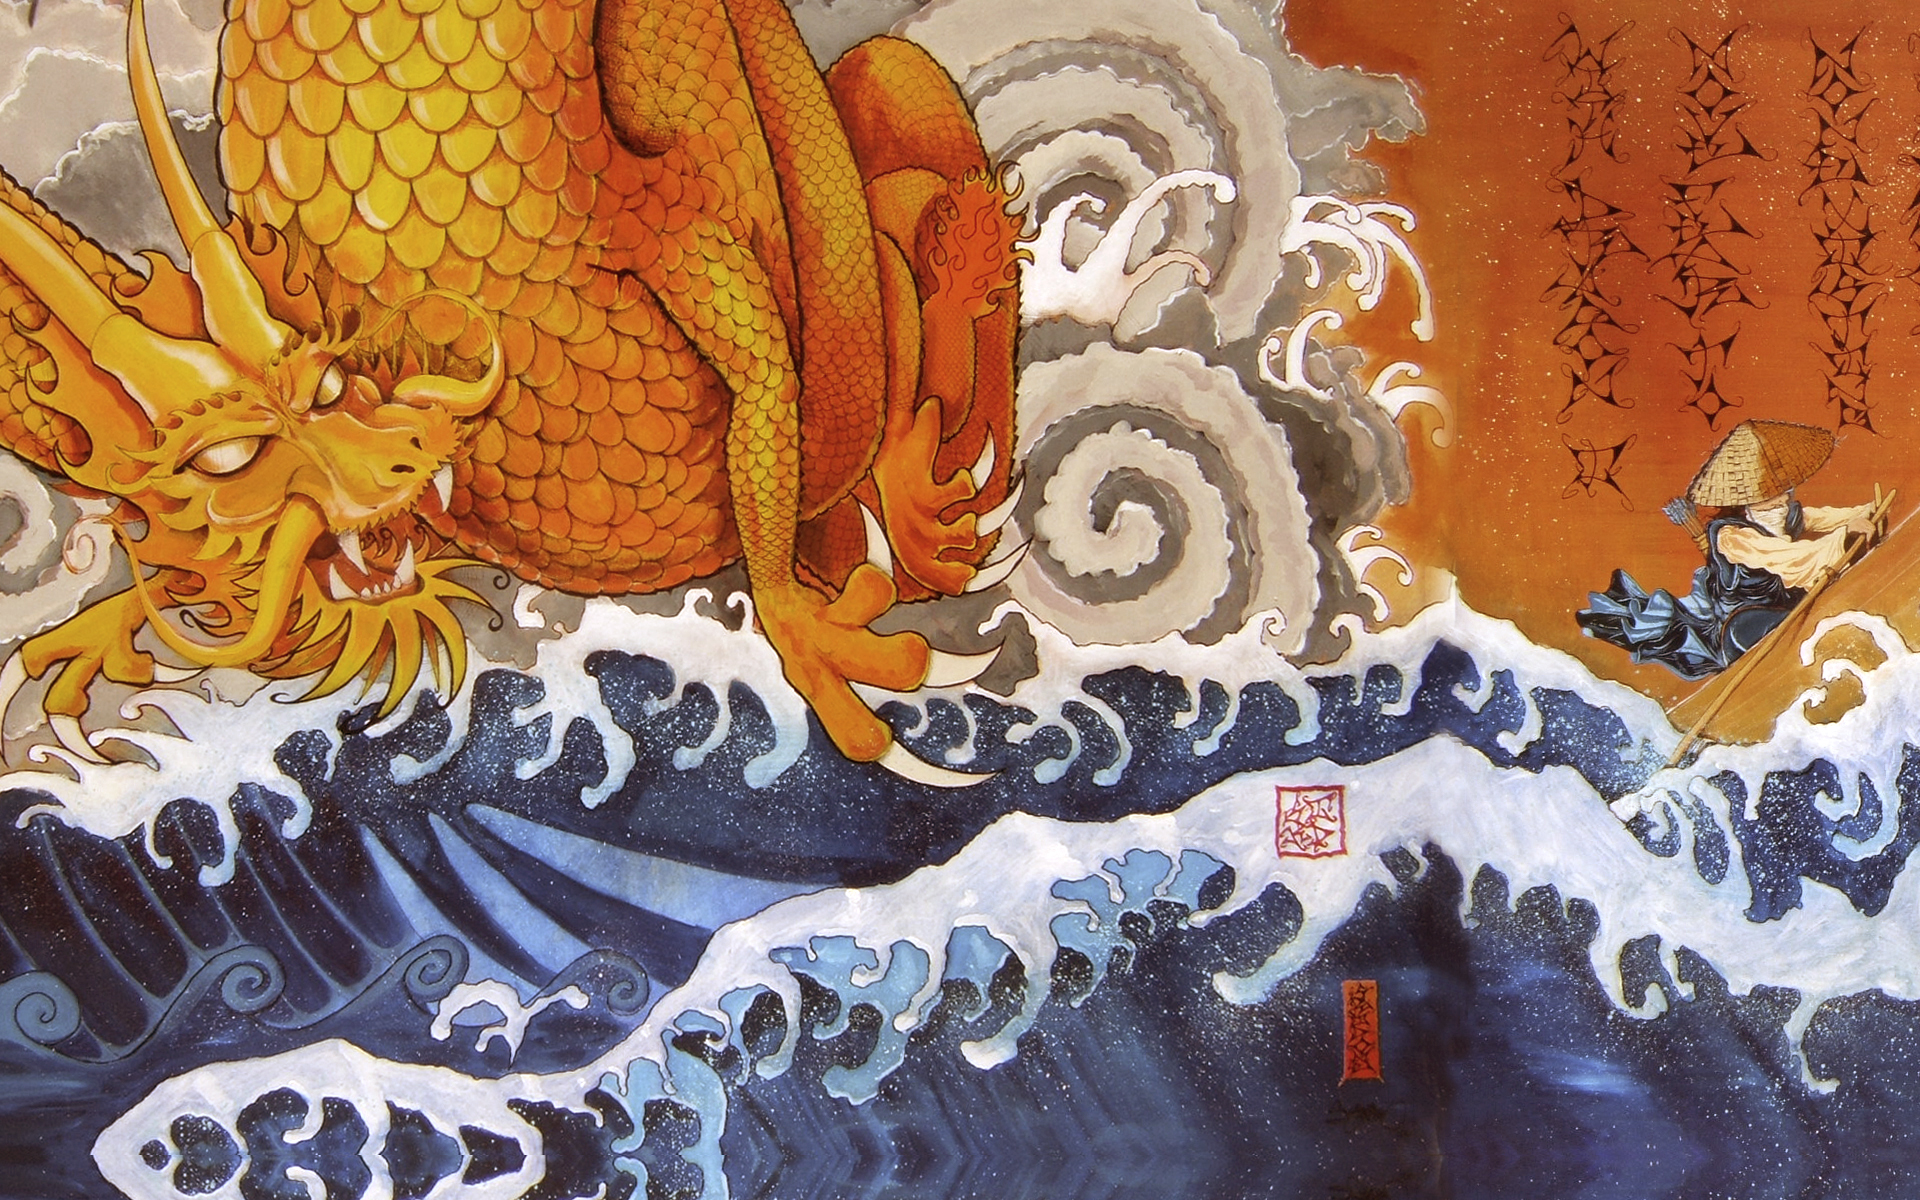 Ukiyo3.com | A Modern Approach to Ukiyo-e Art